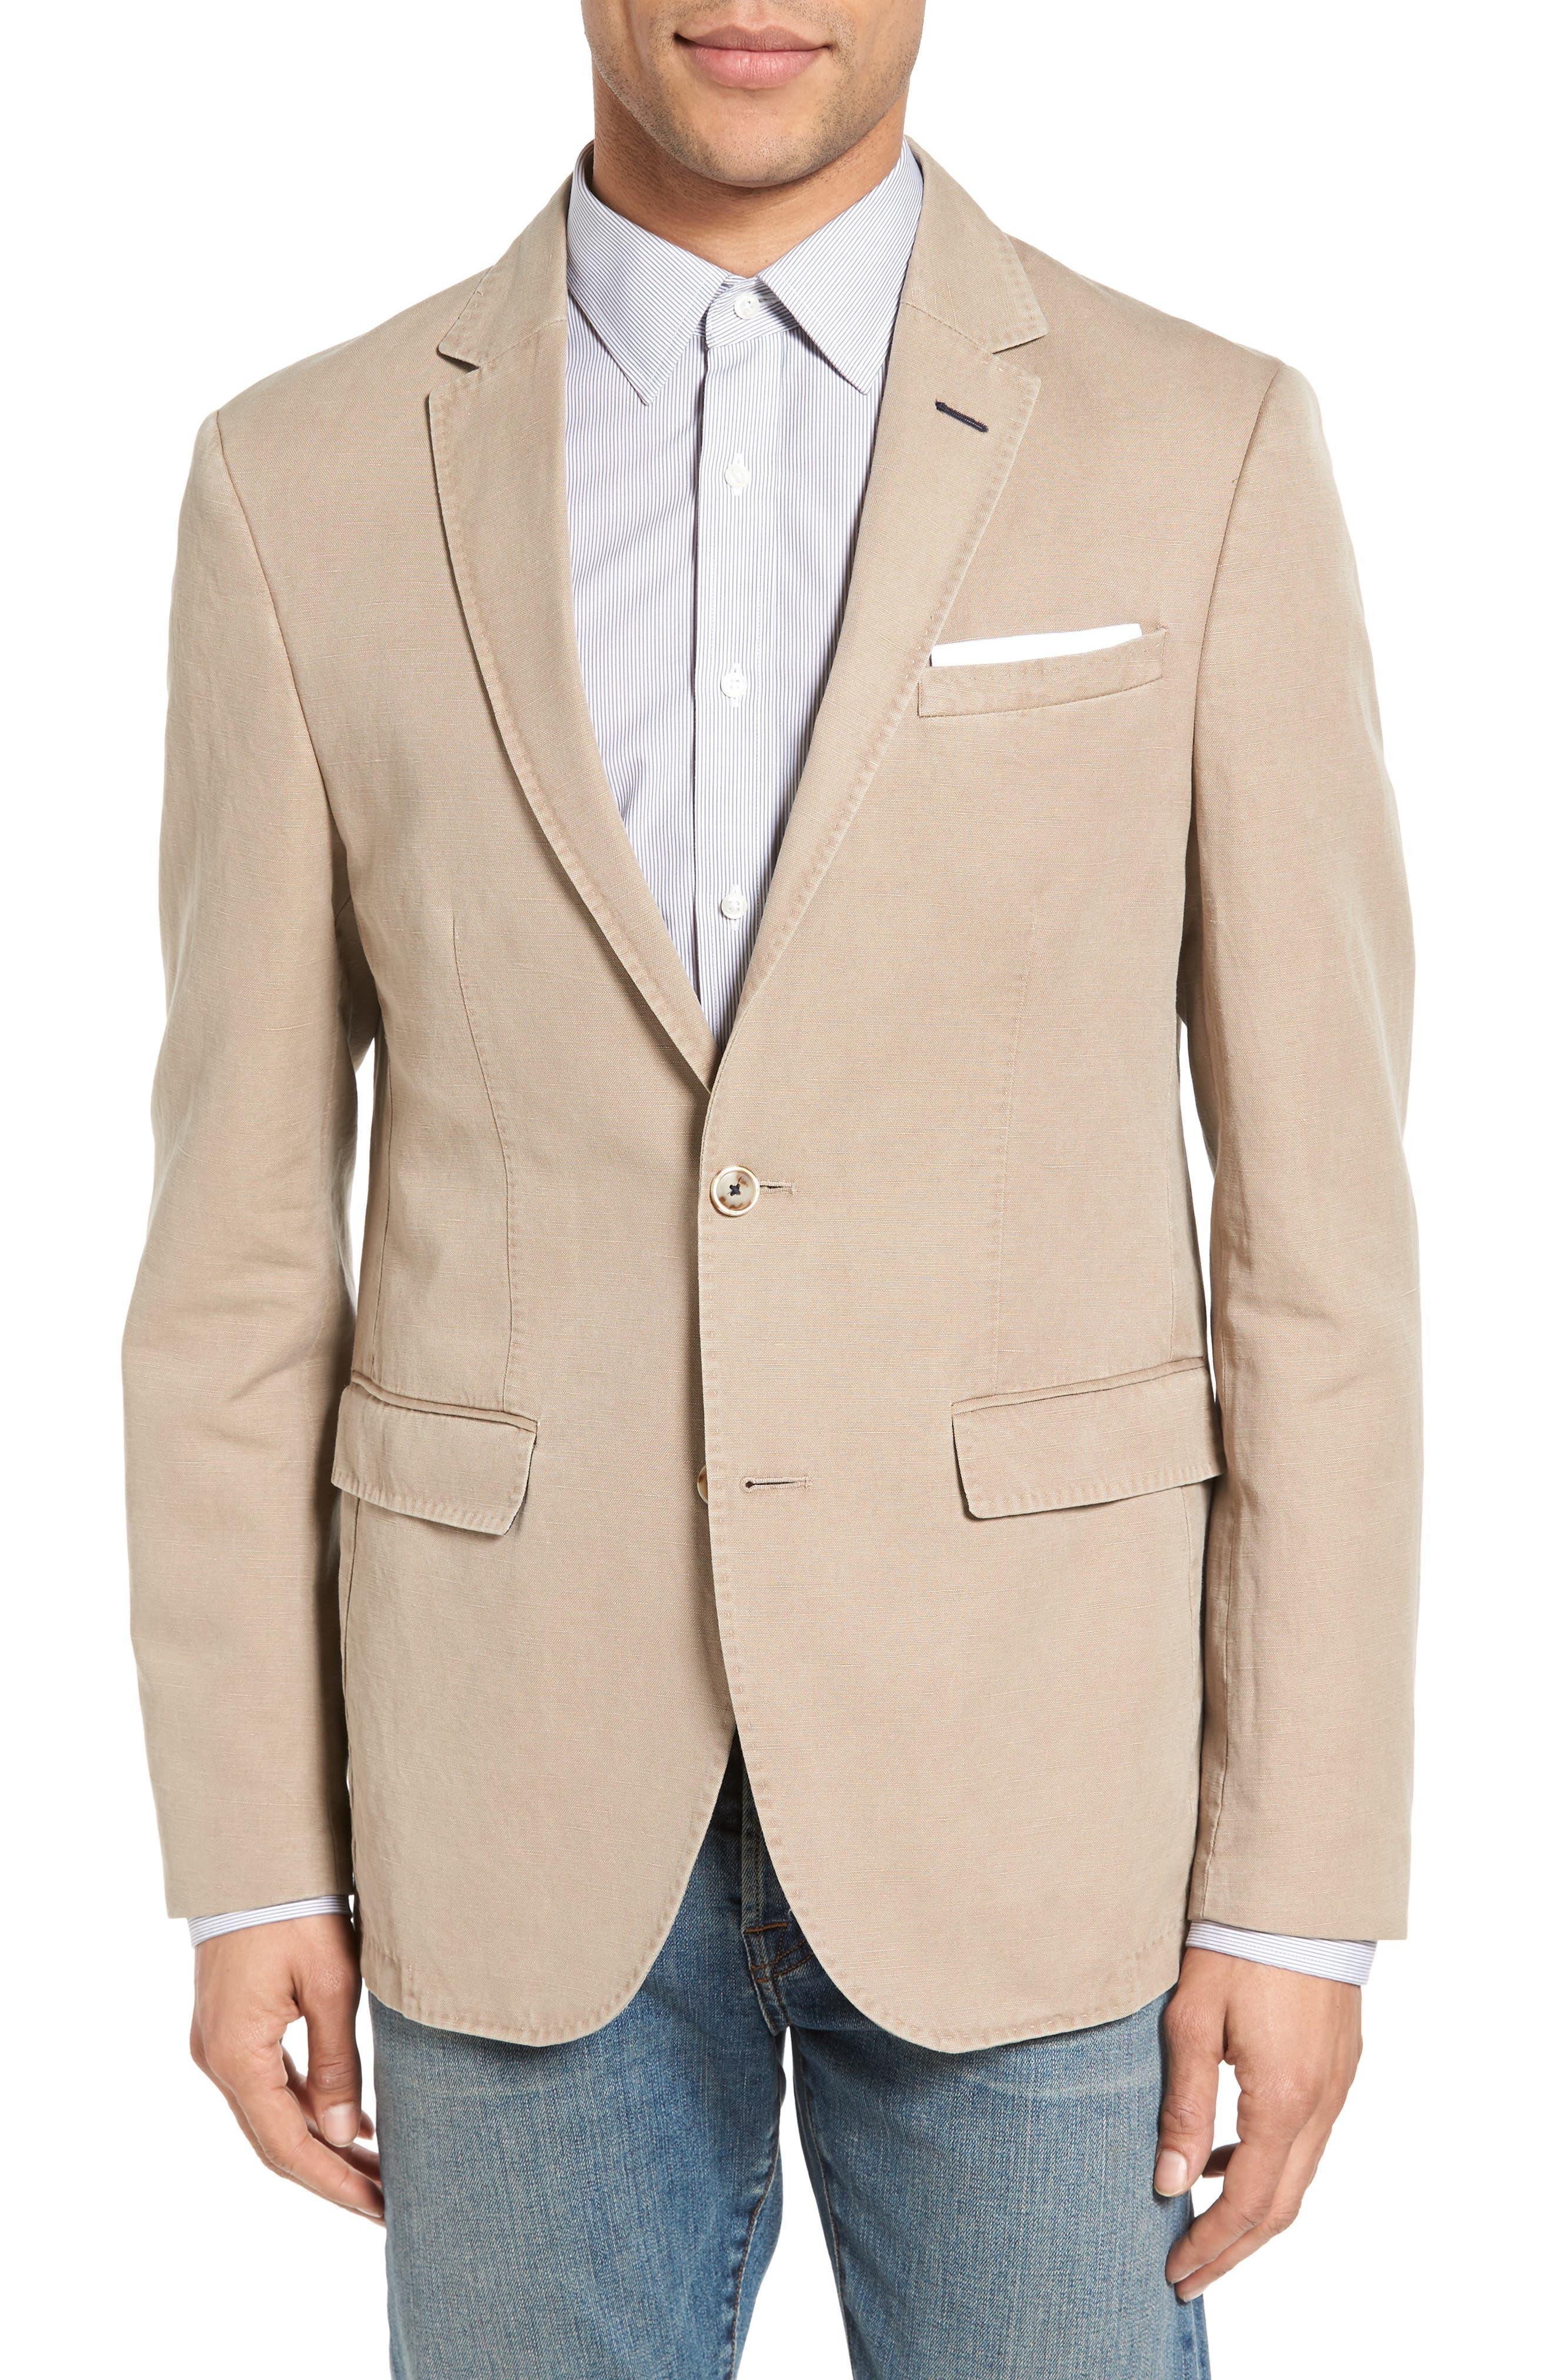 Alternate Image 1 Selected - Sand Trim Fit Cotton & Linen Blazer